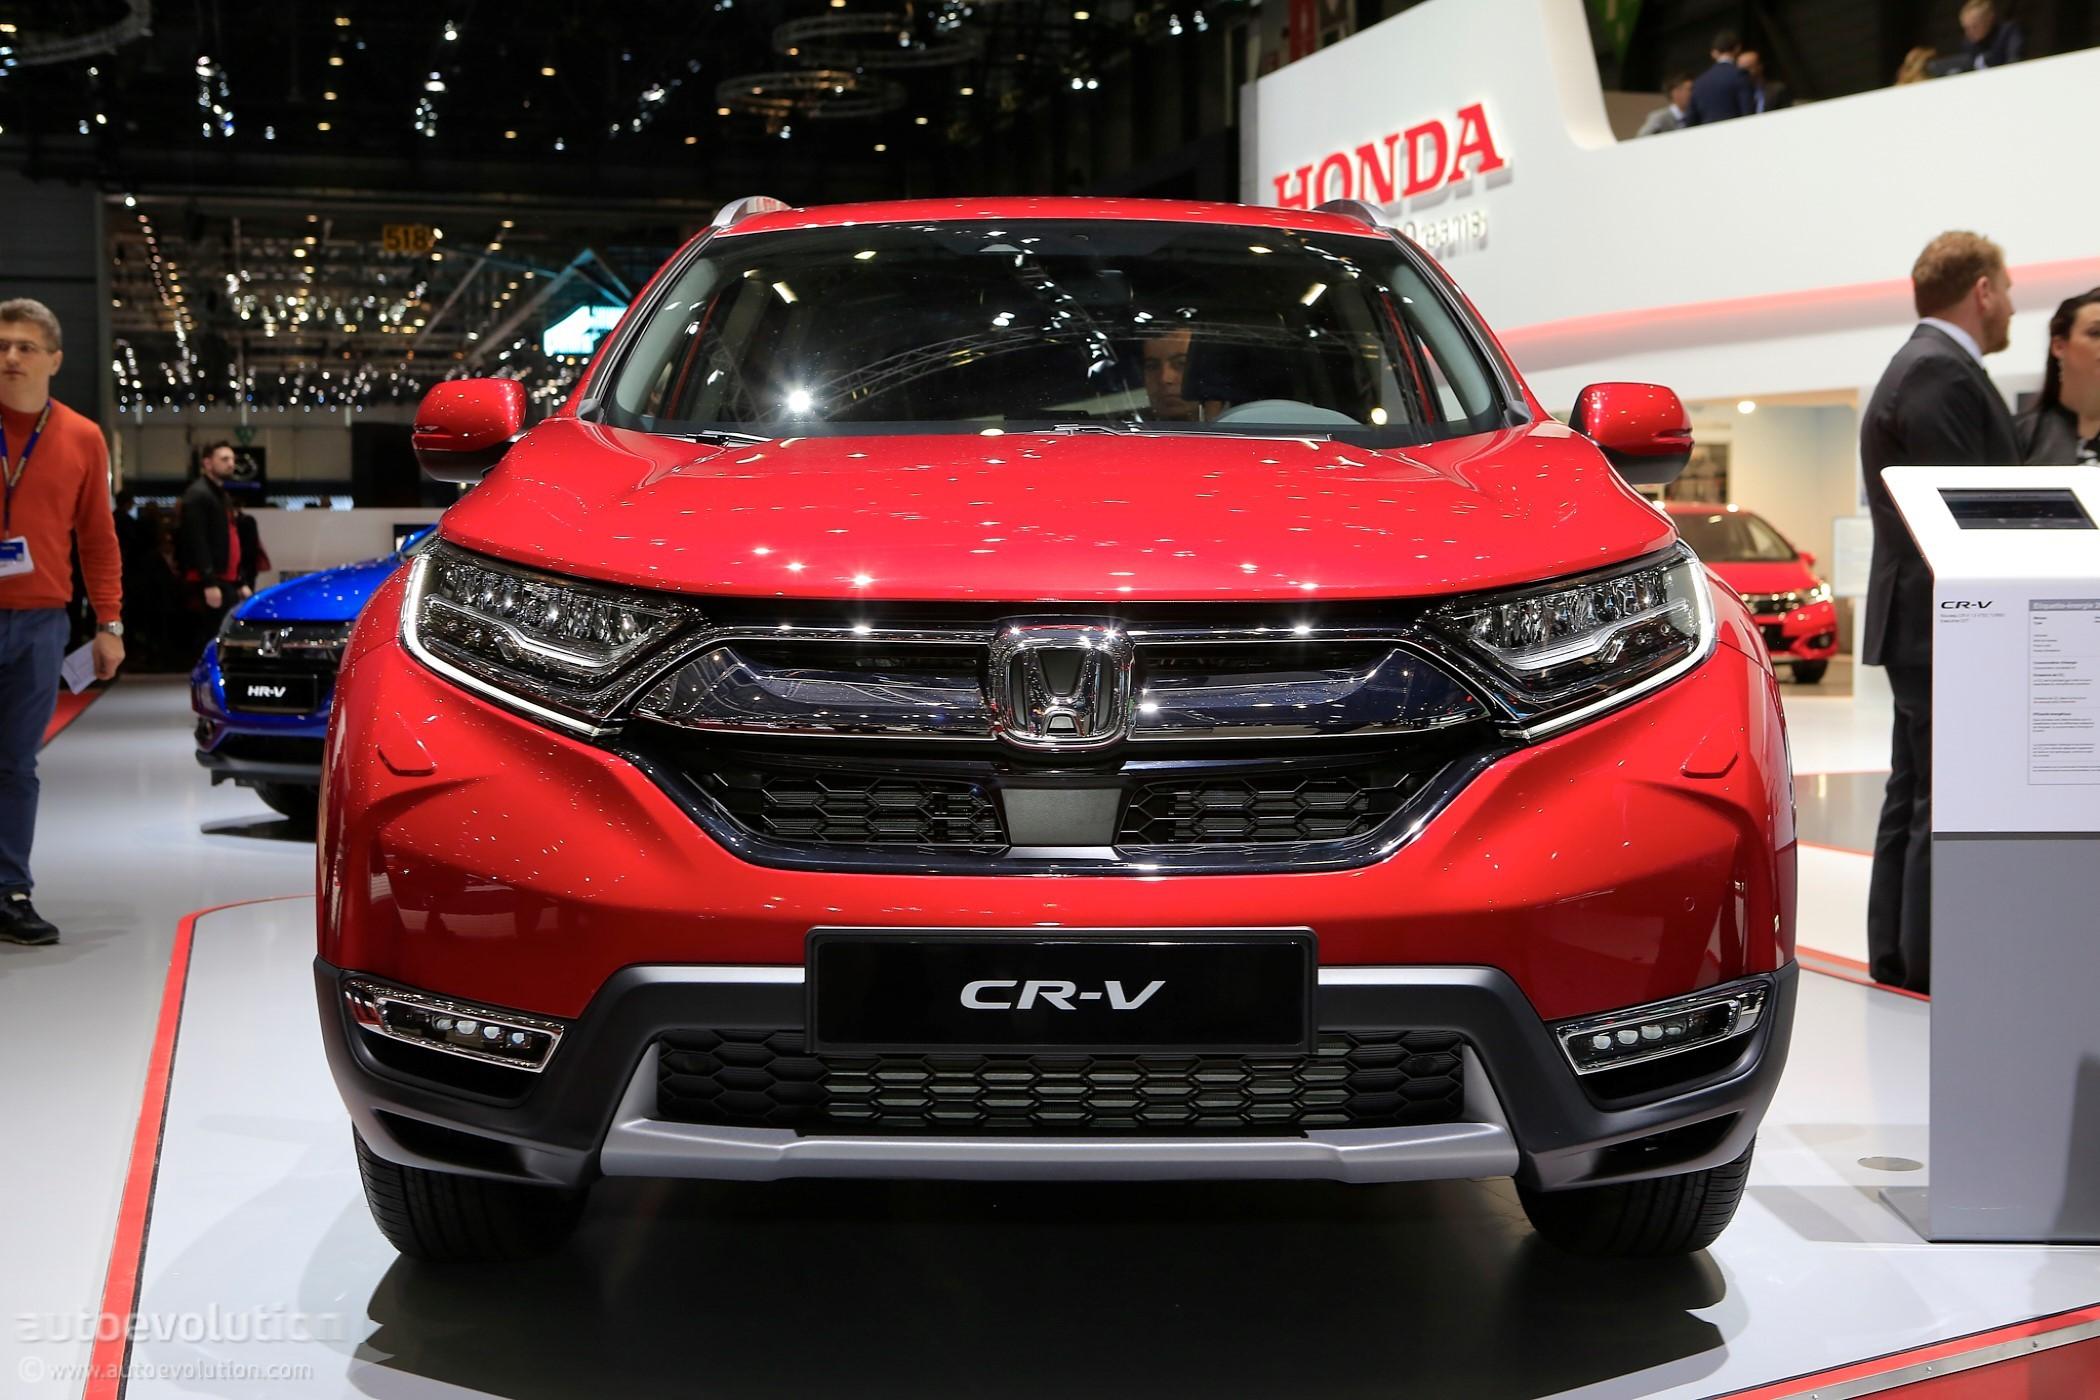 Honda CR-V 1.5 VTEC Turbo Suspected Of Engine Problem ...